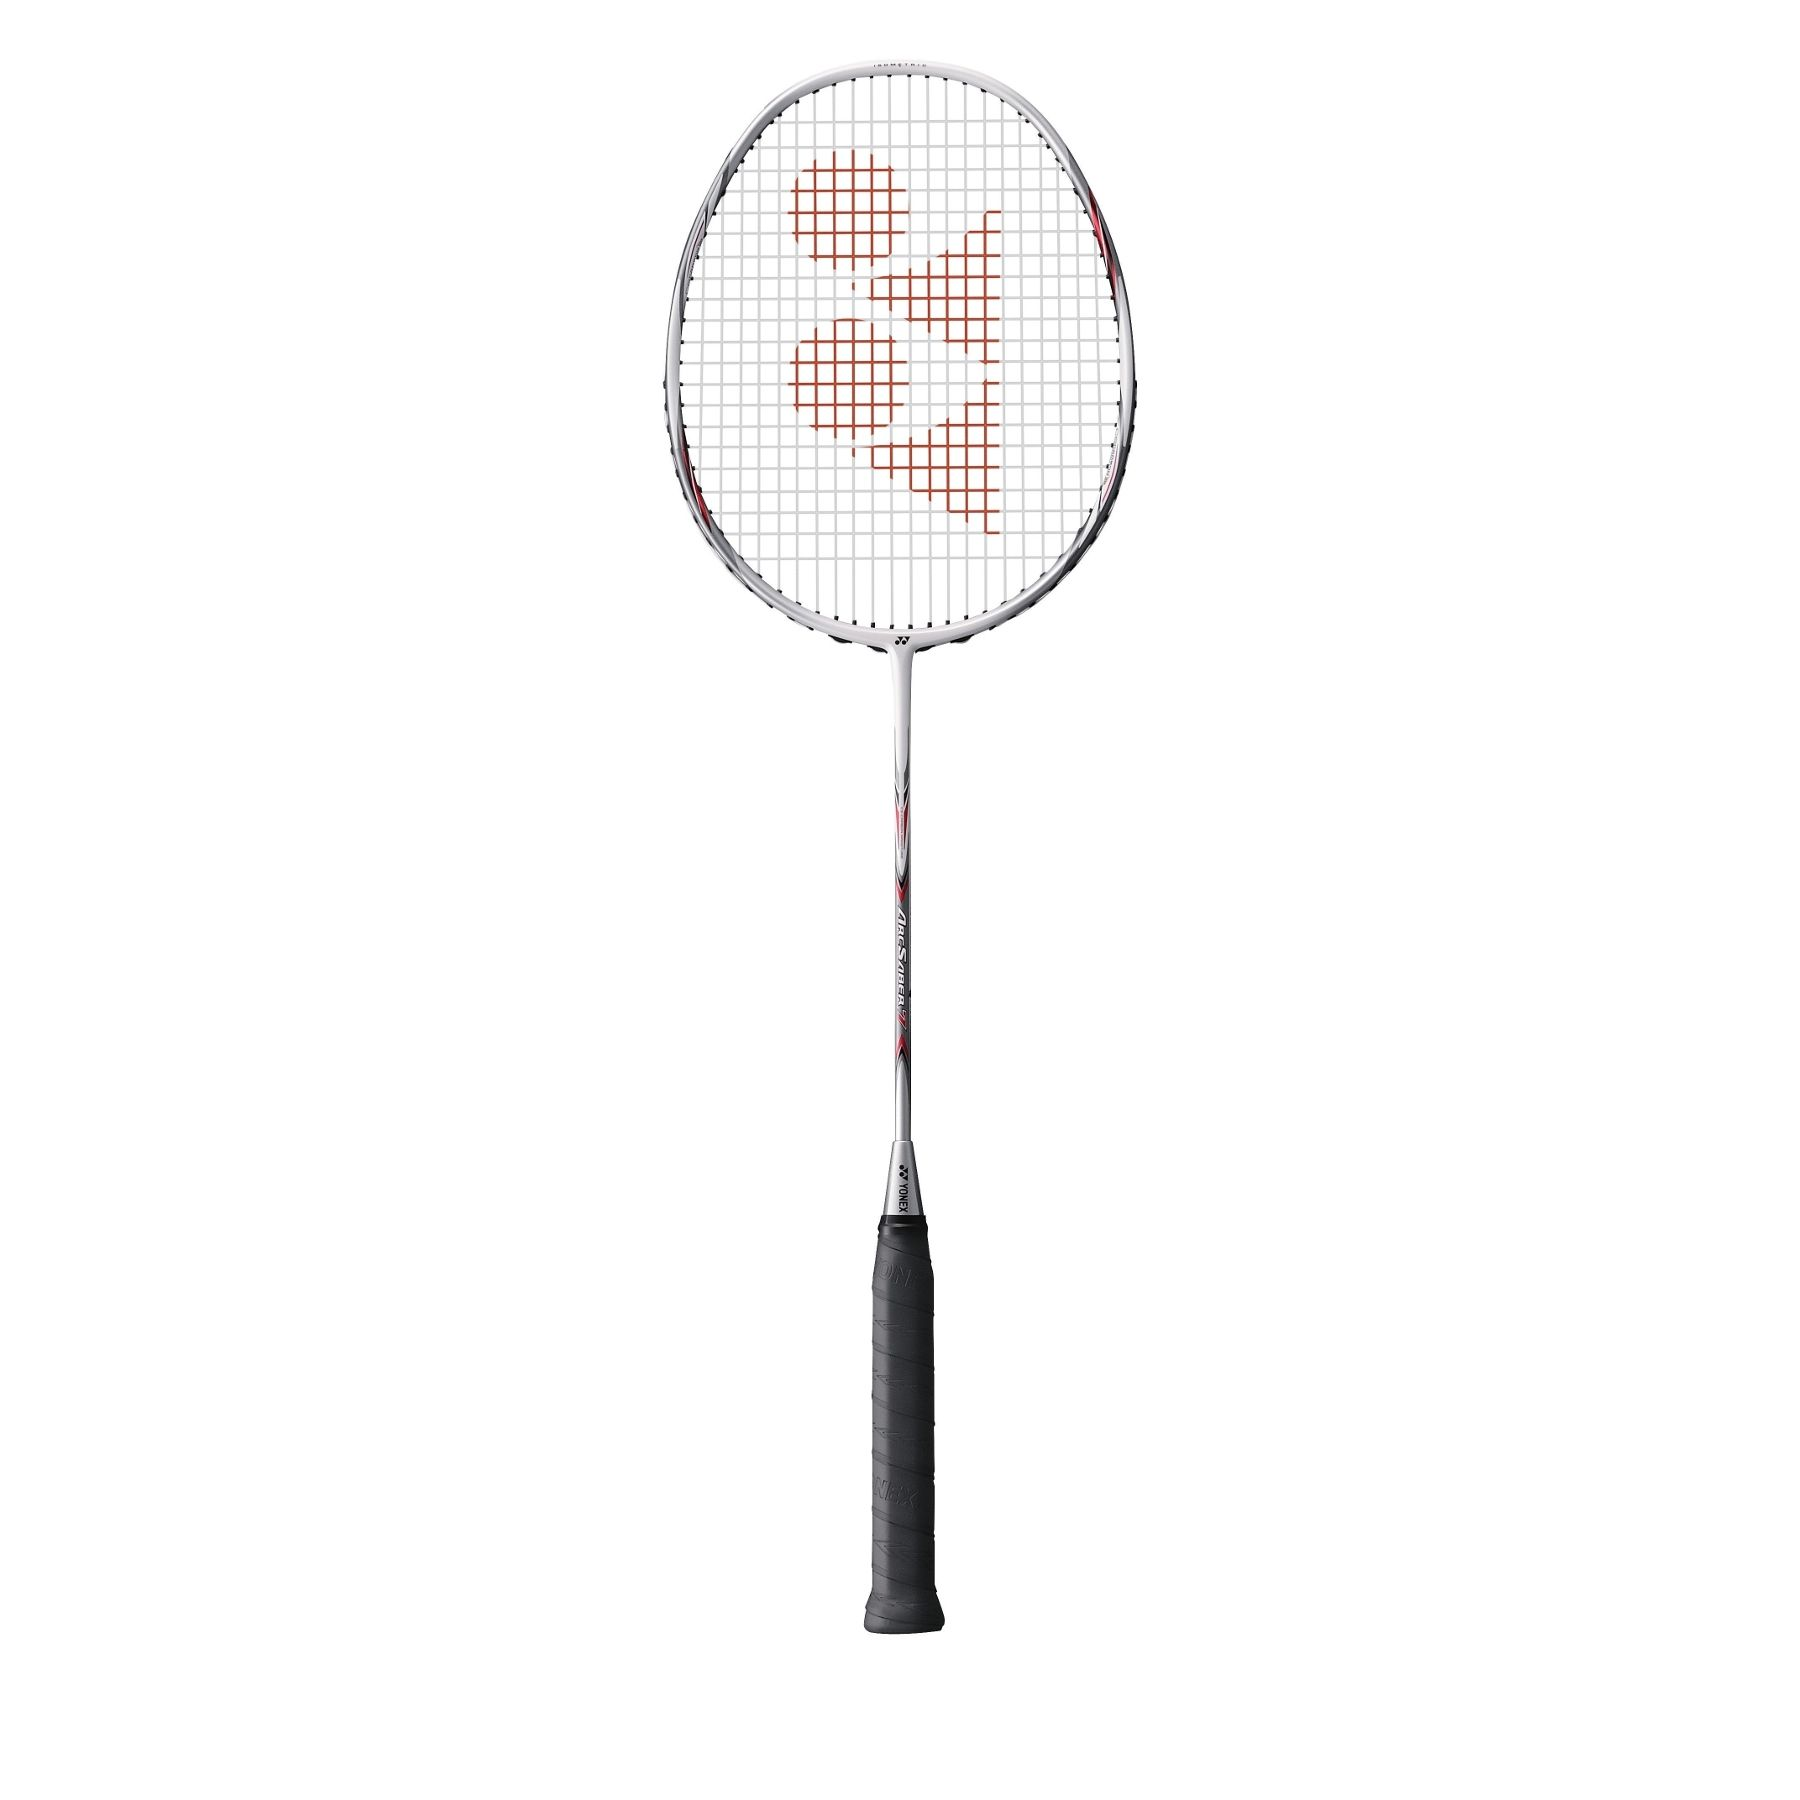 Yonex Arcsaber 7 Badminton Racket Sweatband Com